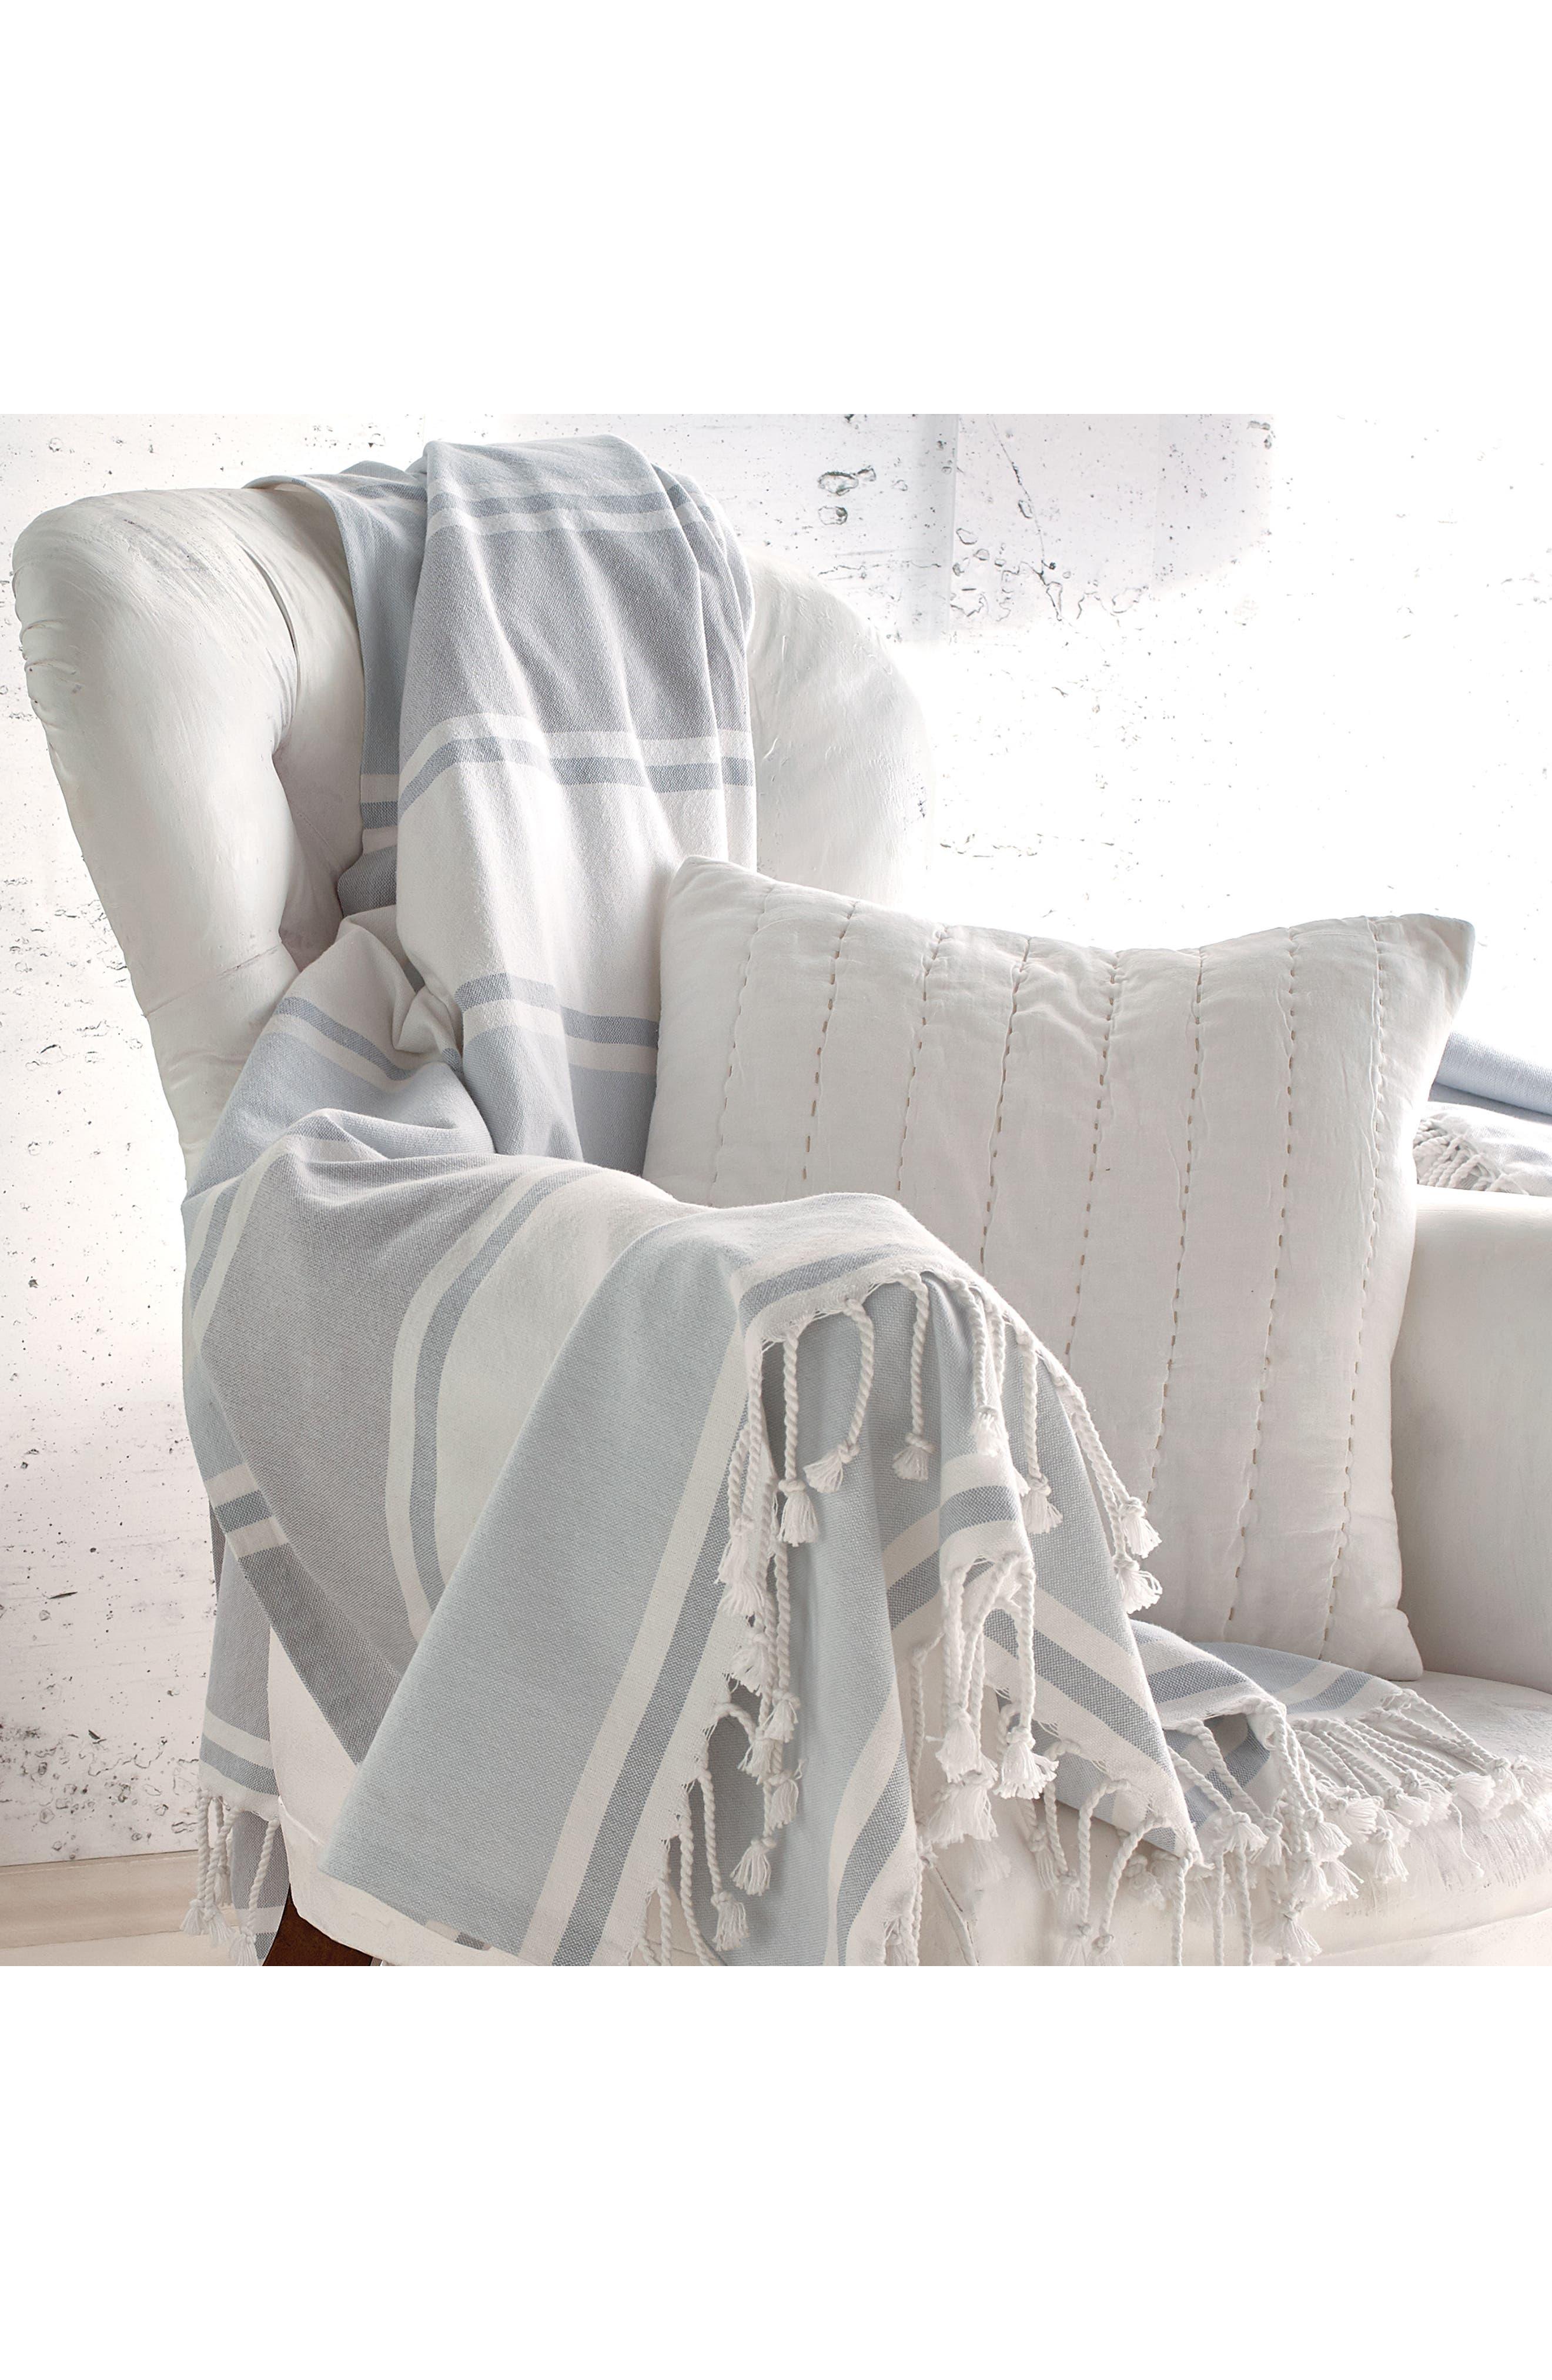 Donna Karan New York Pure Stripe Blanket,                             Alternate thumbnail 2, color,                             Blue